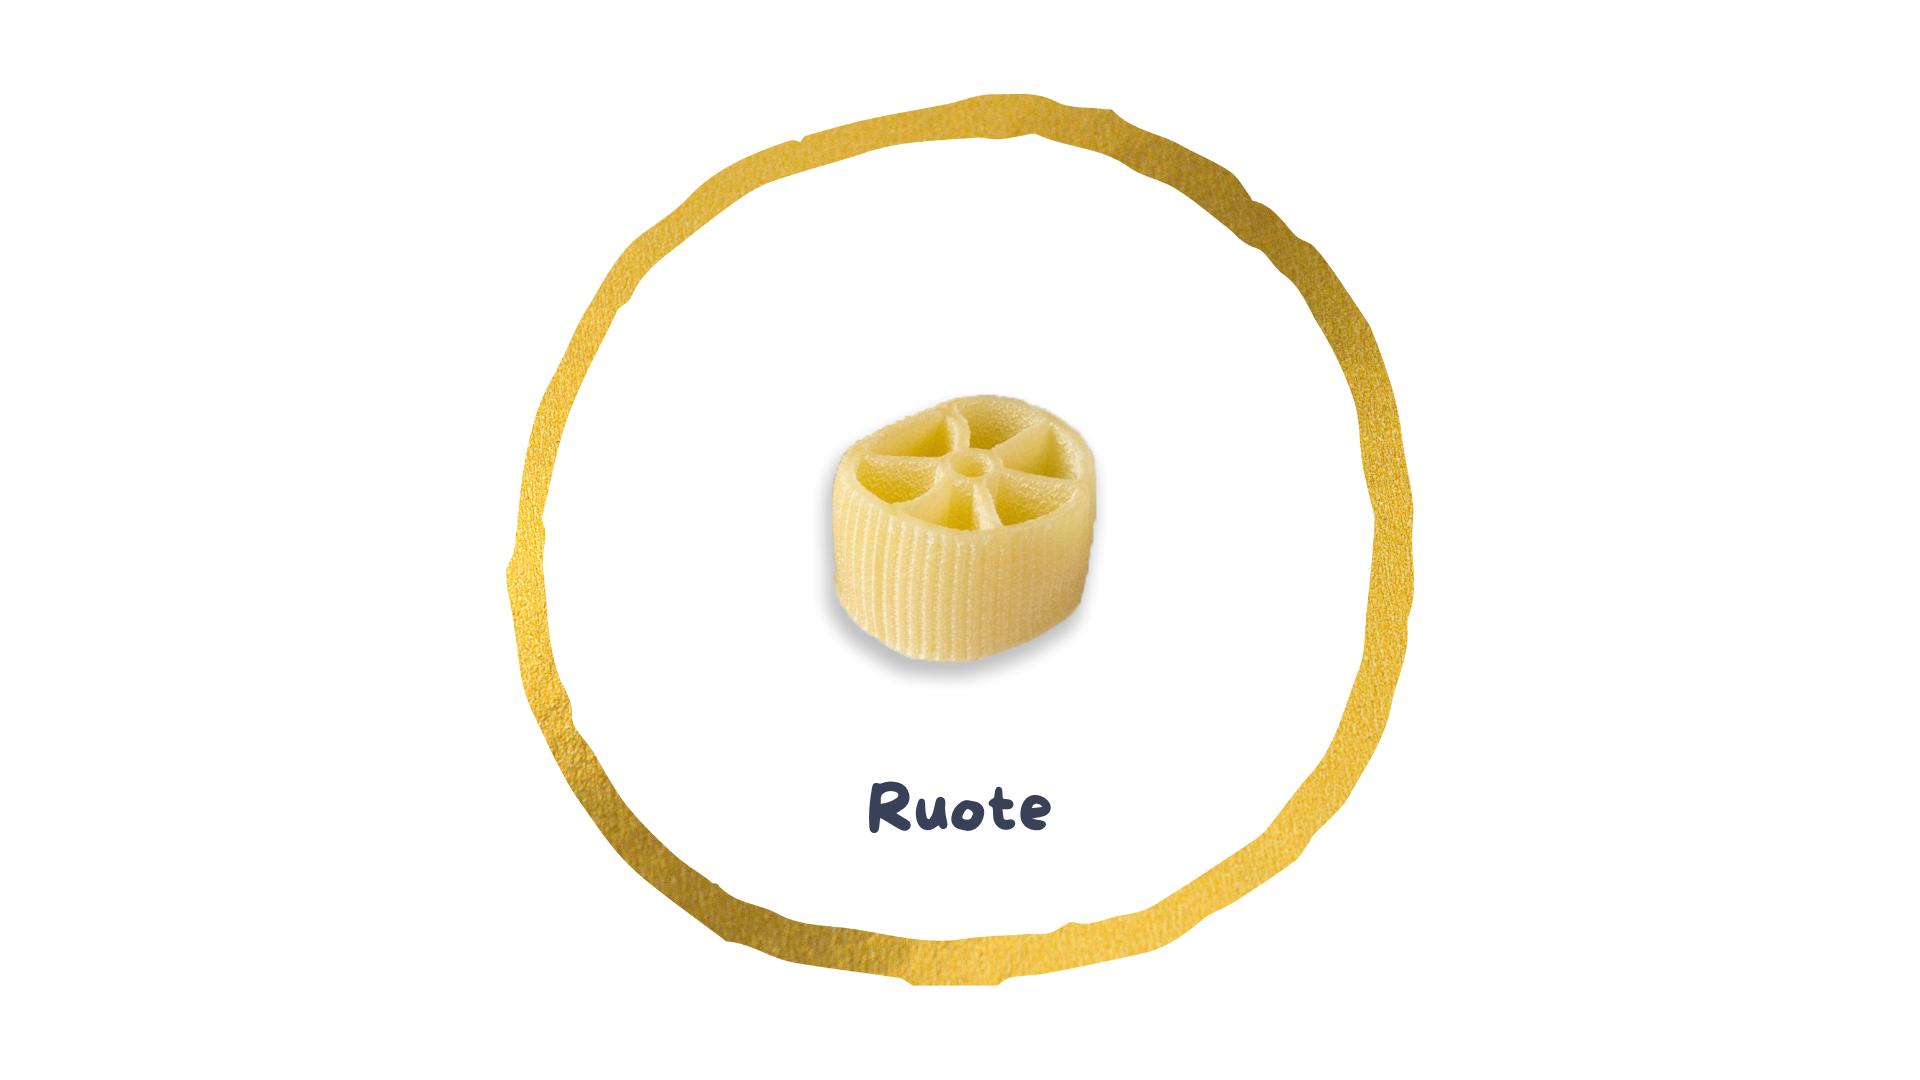 ruote